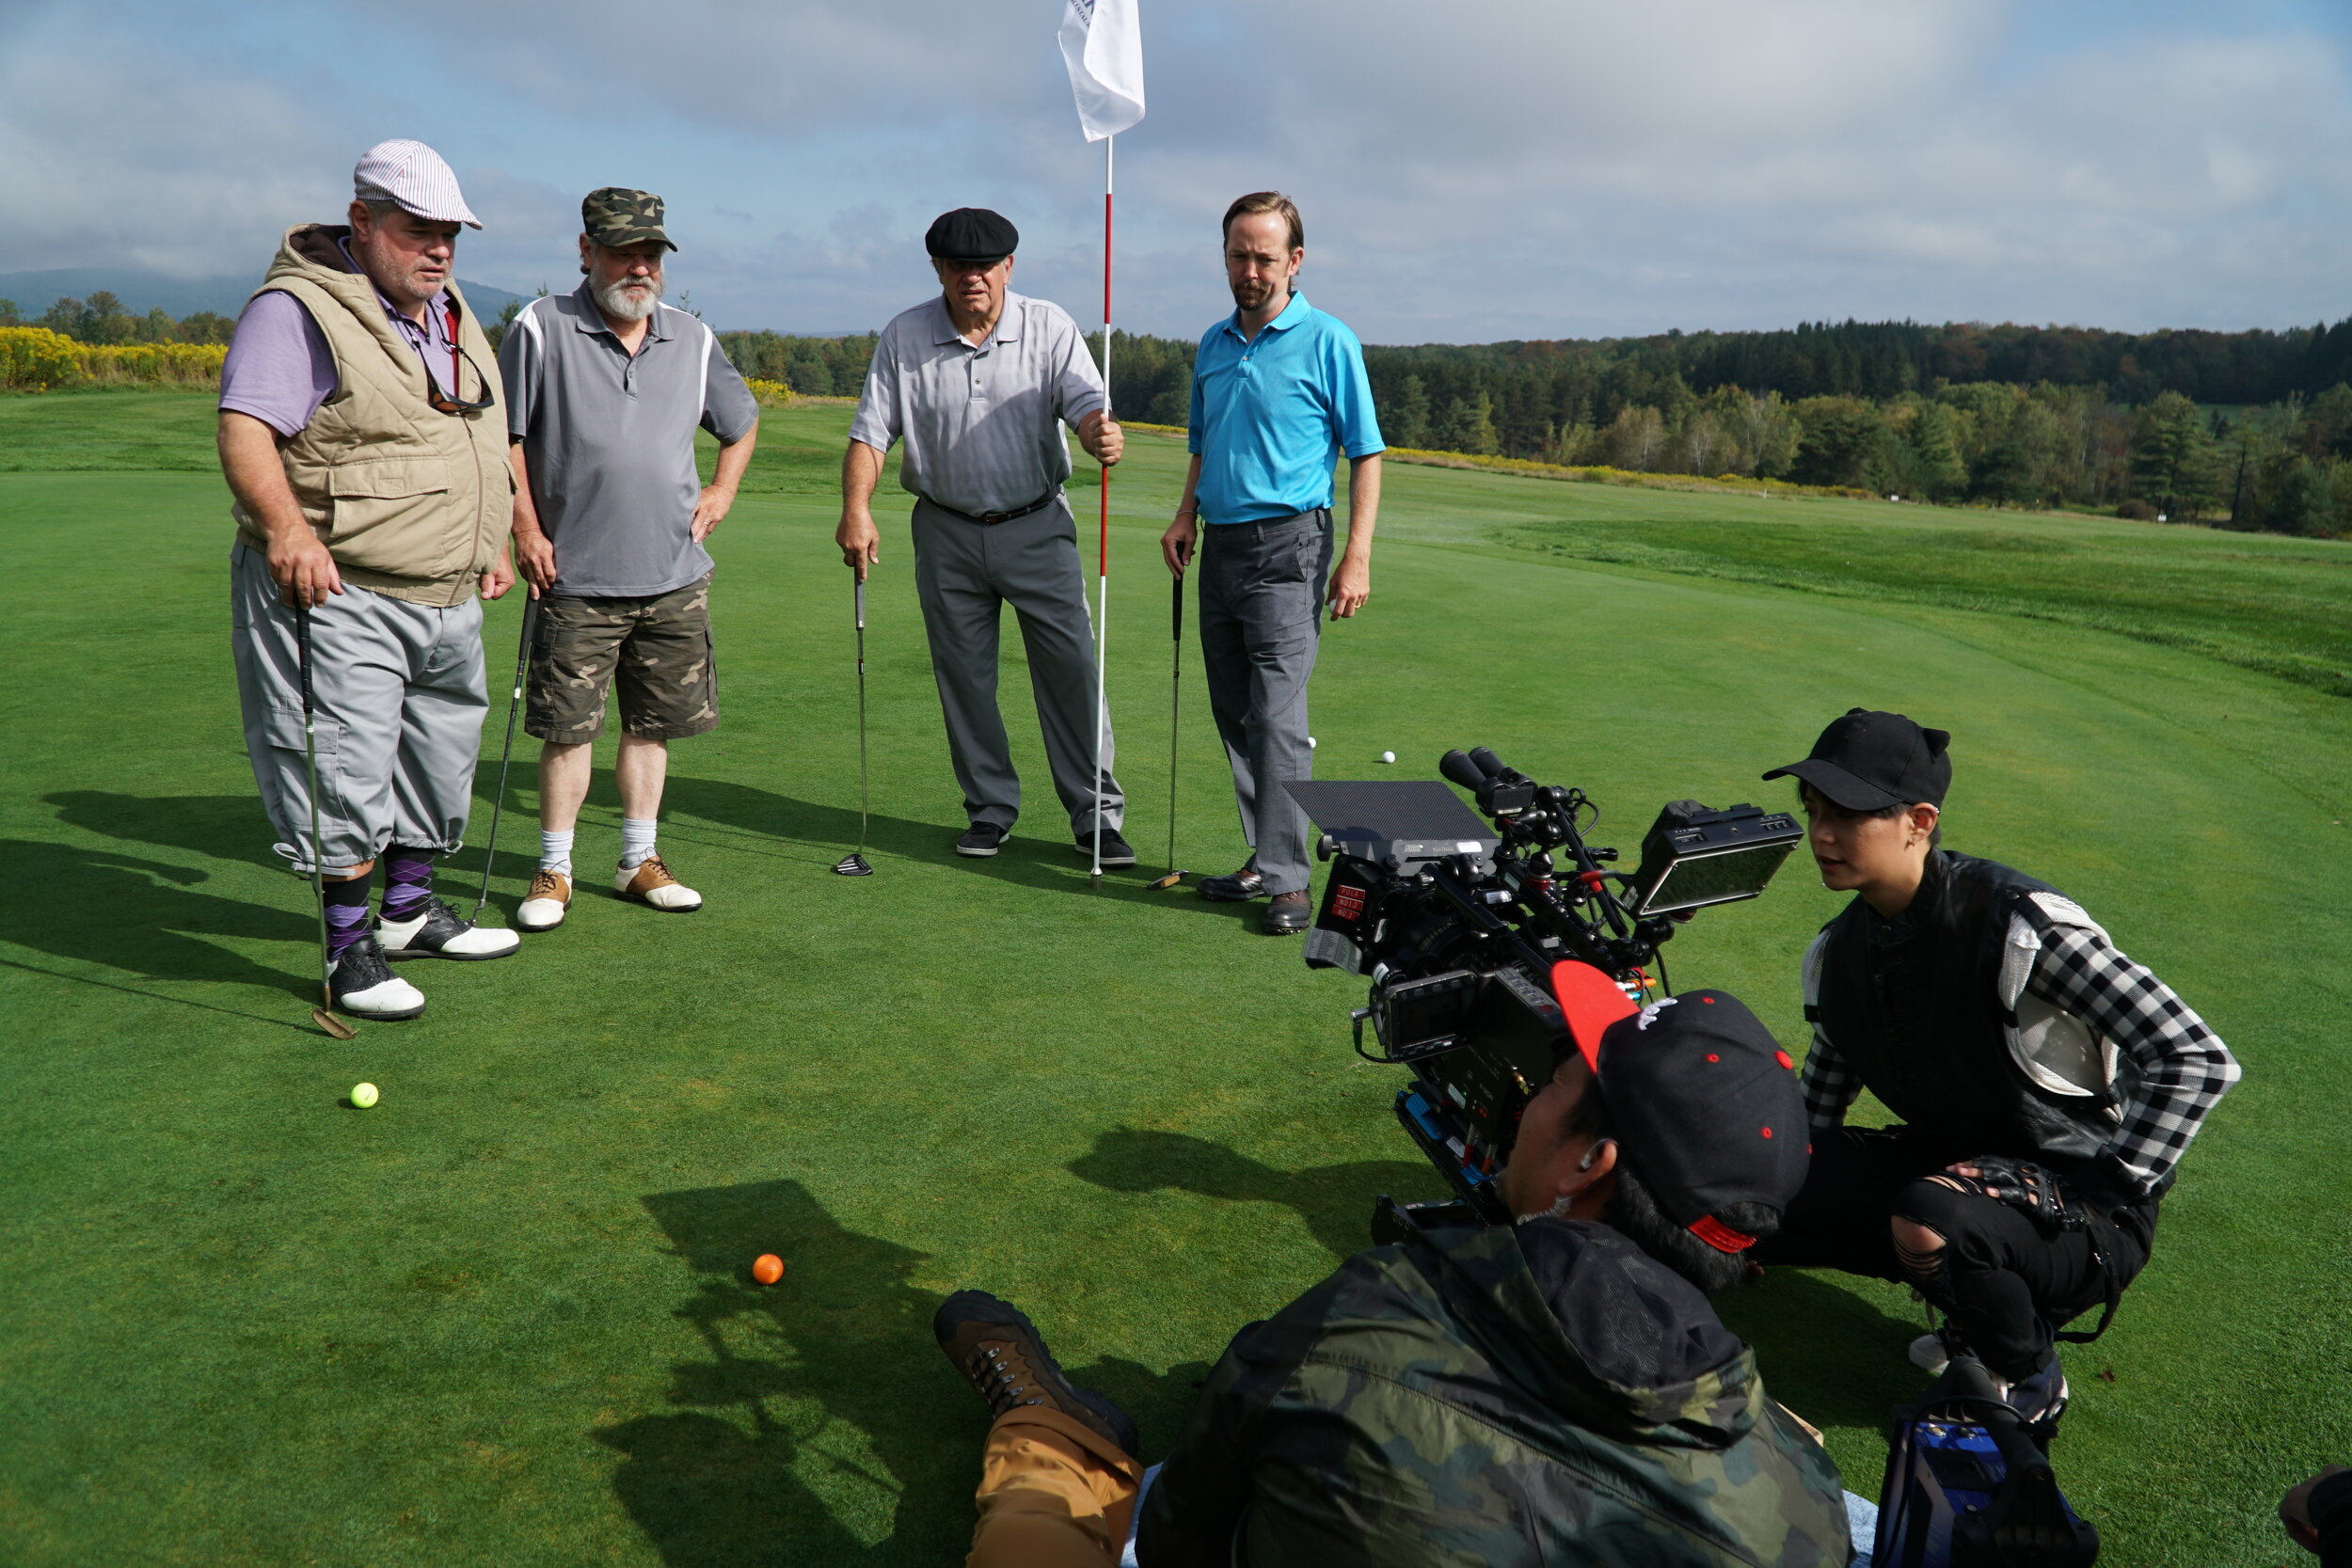 Director of Photographer, Leonidas Jaramillo, checks a shot with Amber Liu of the golf partners.